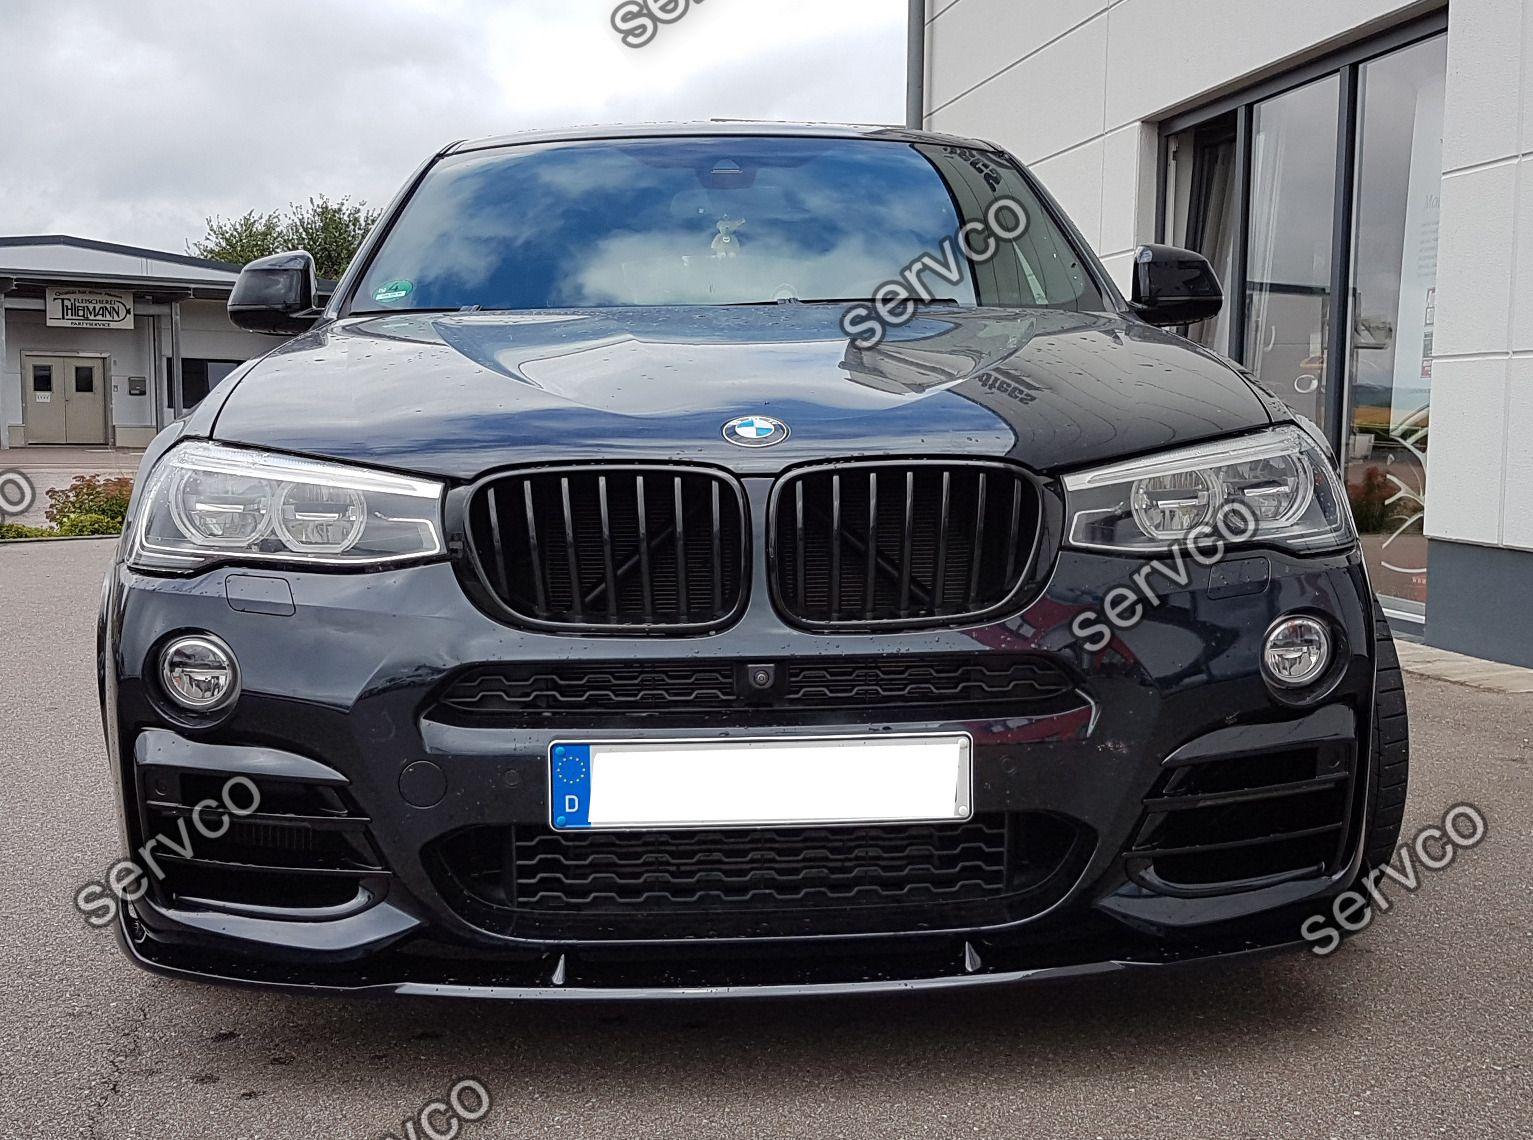 Prelungire tuning sport bara fata BMW X4 M doar pt bara fata X4 M 2014-2018 v1